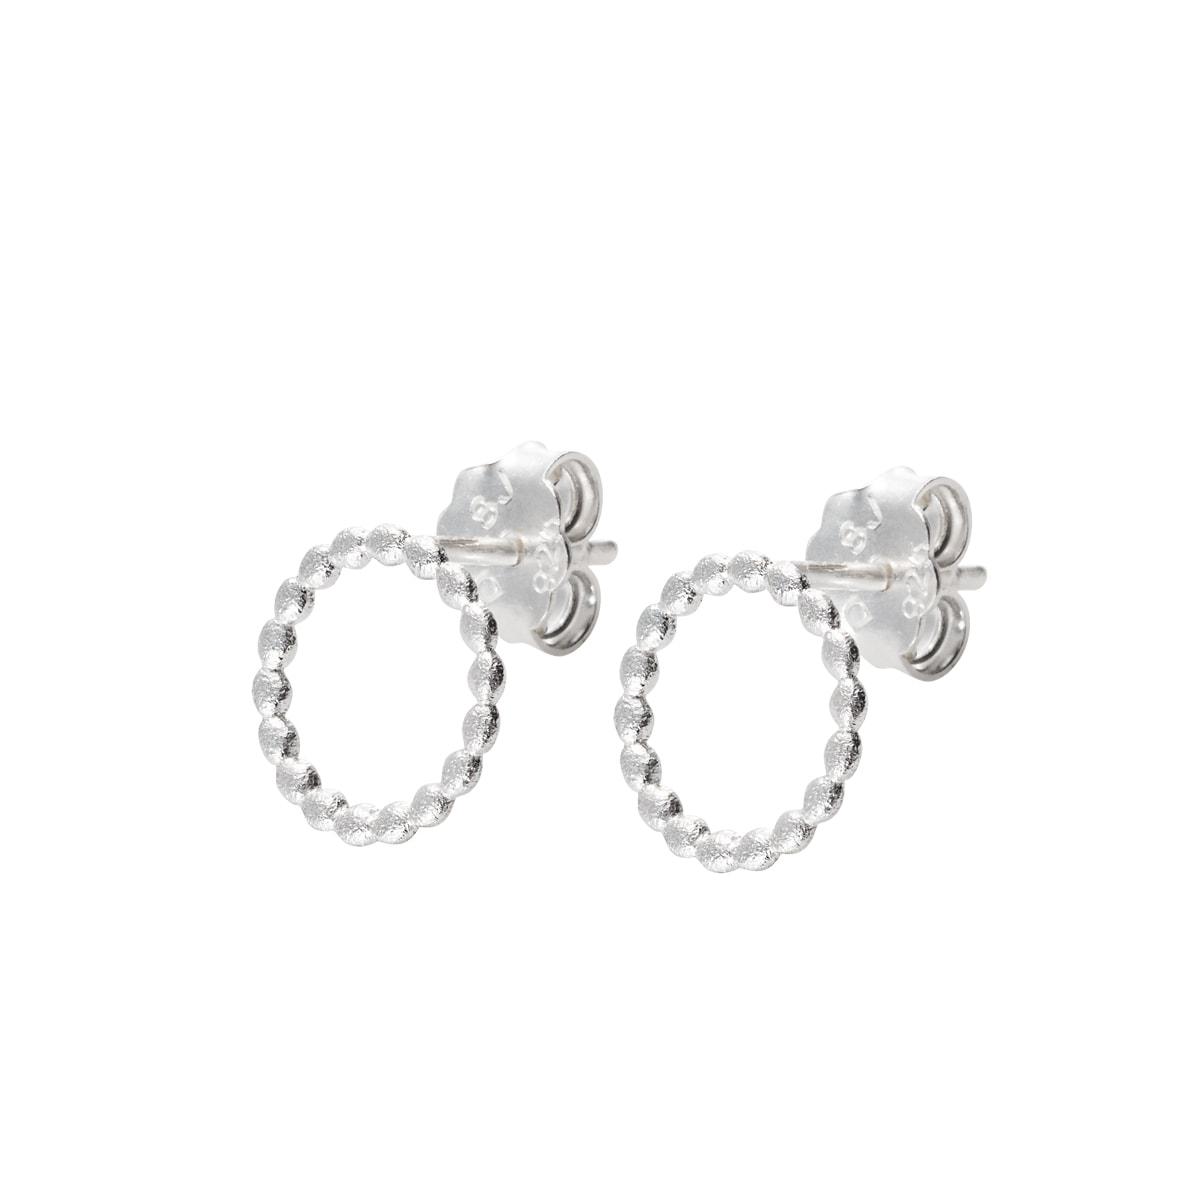 Halo Studs earring